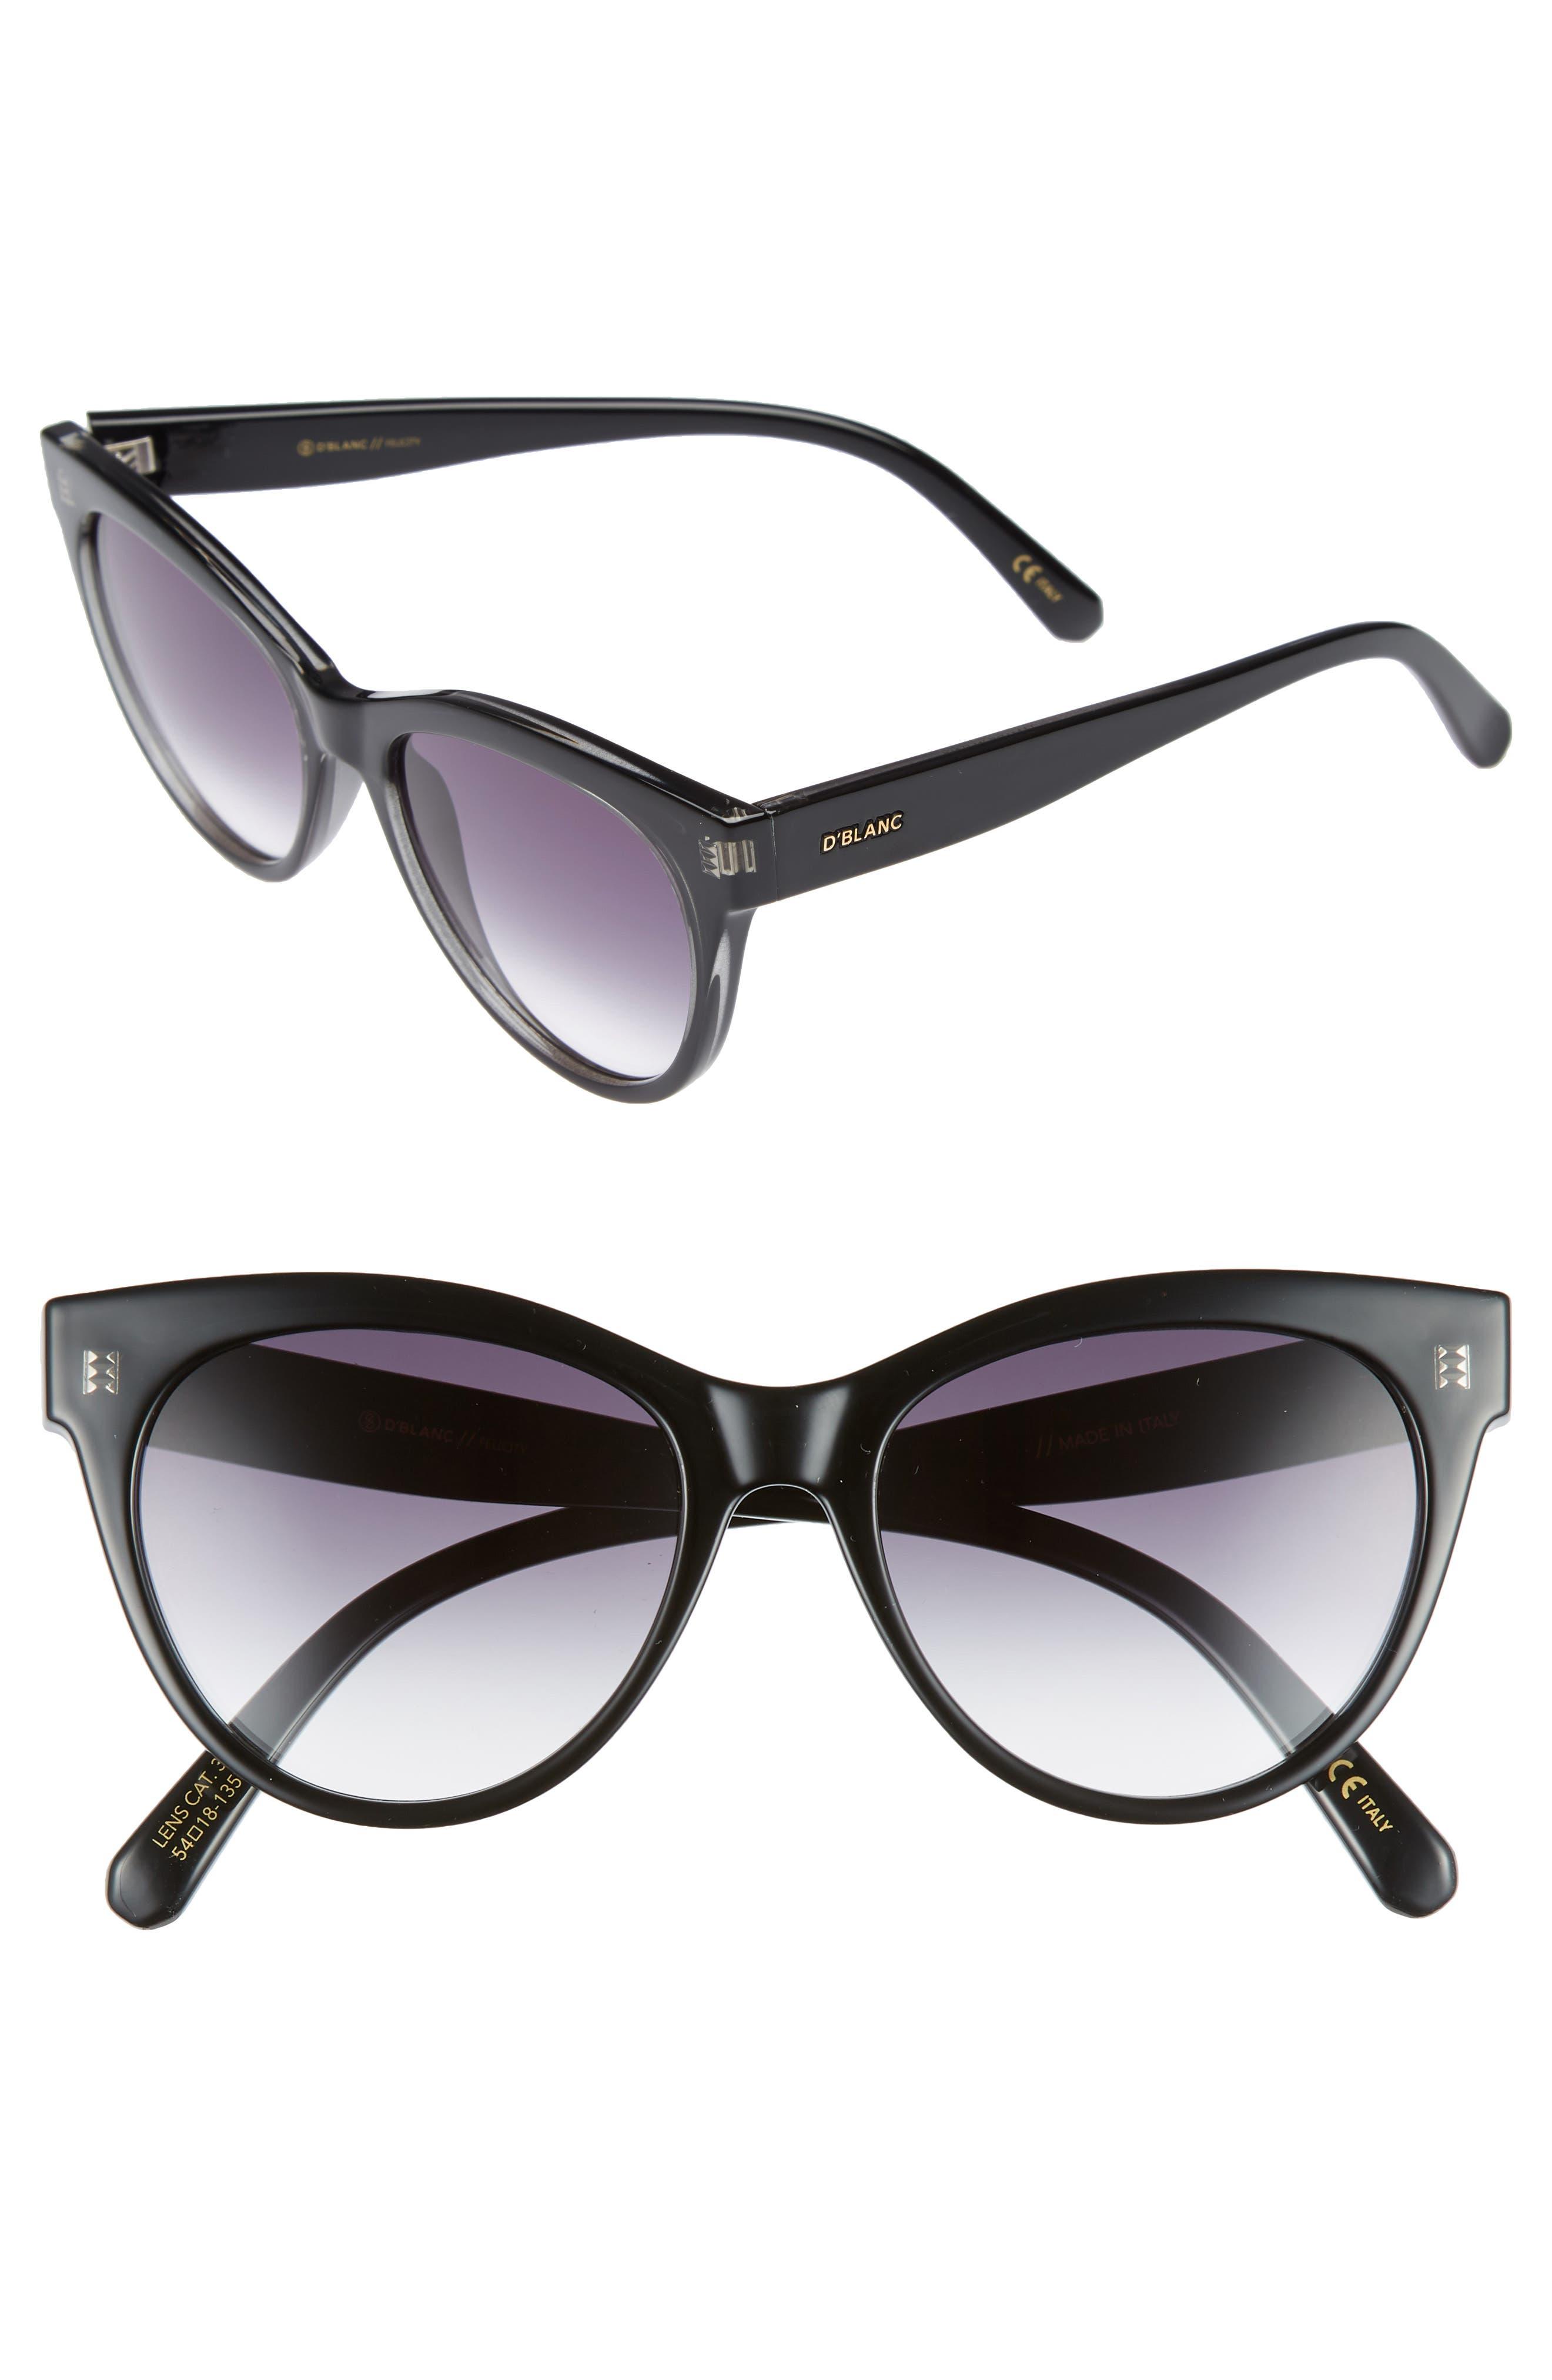 D'BLANC Felicity 54mm Cat Eye Sunglasses,                             Main thumbnail 1, color,                             001